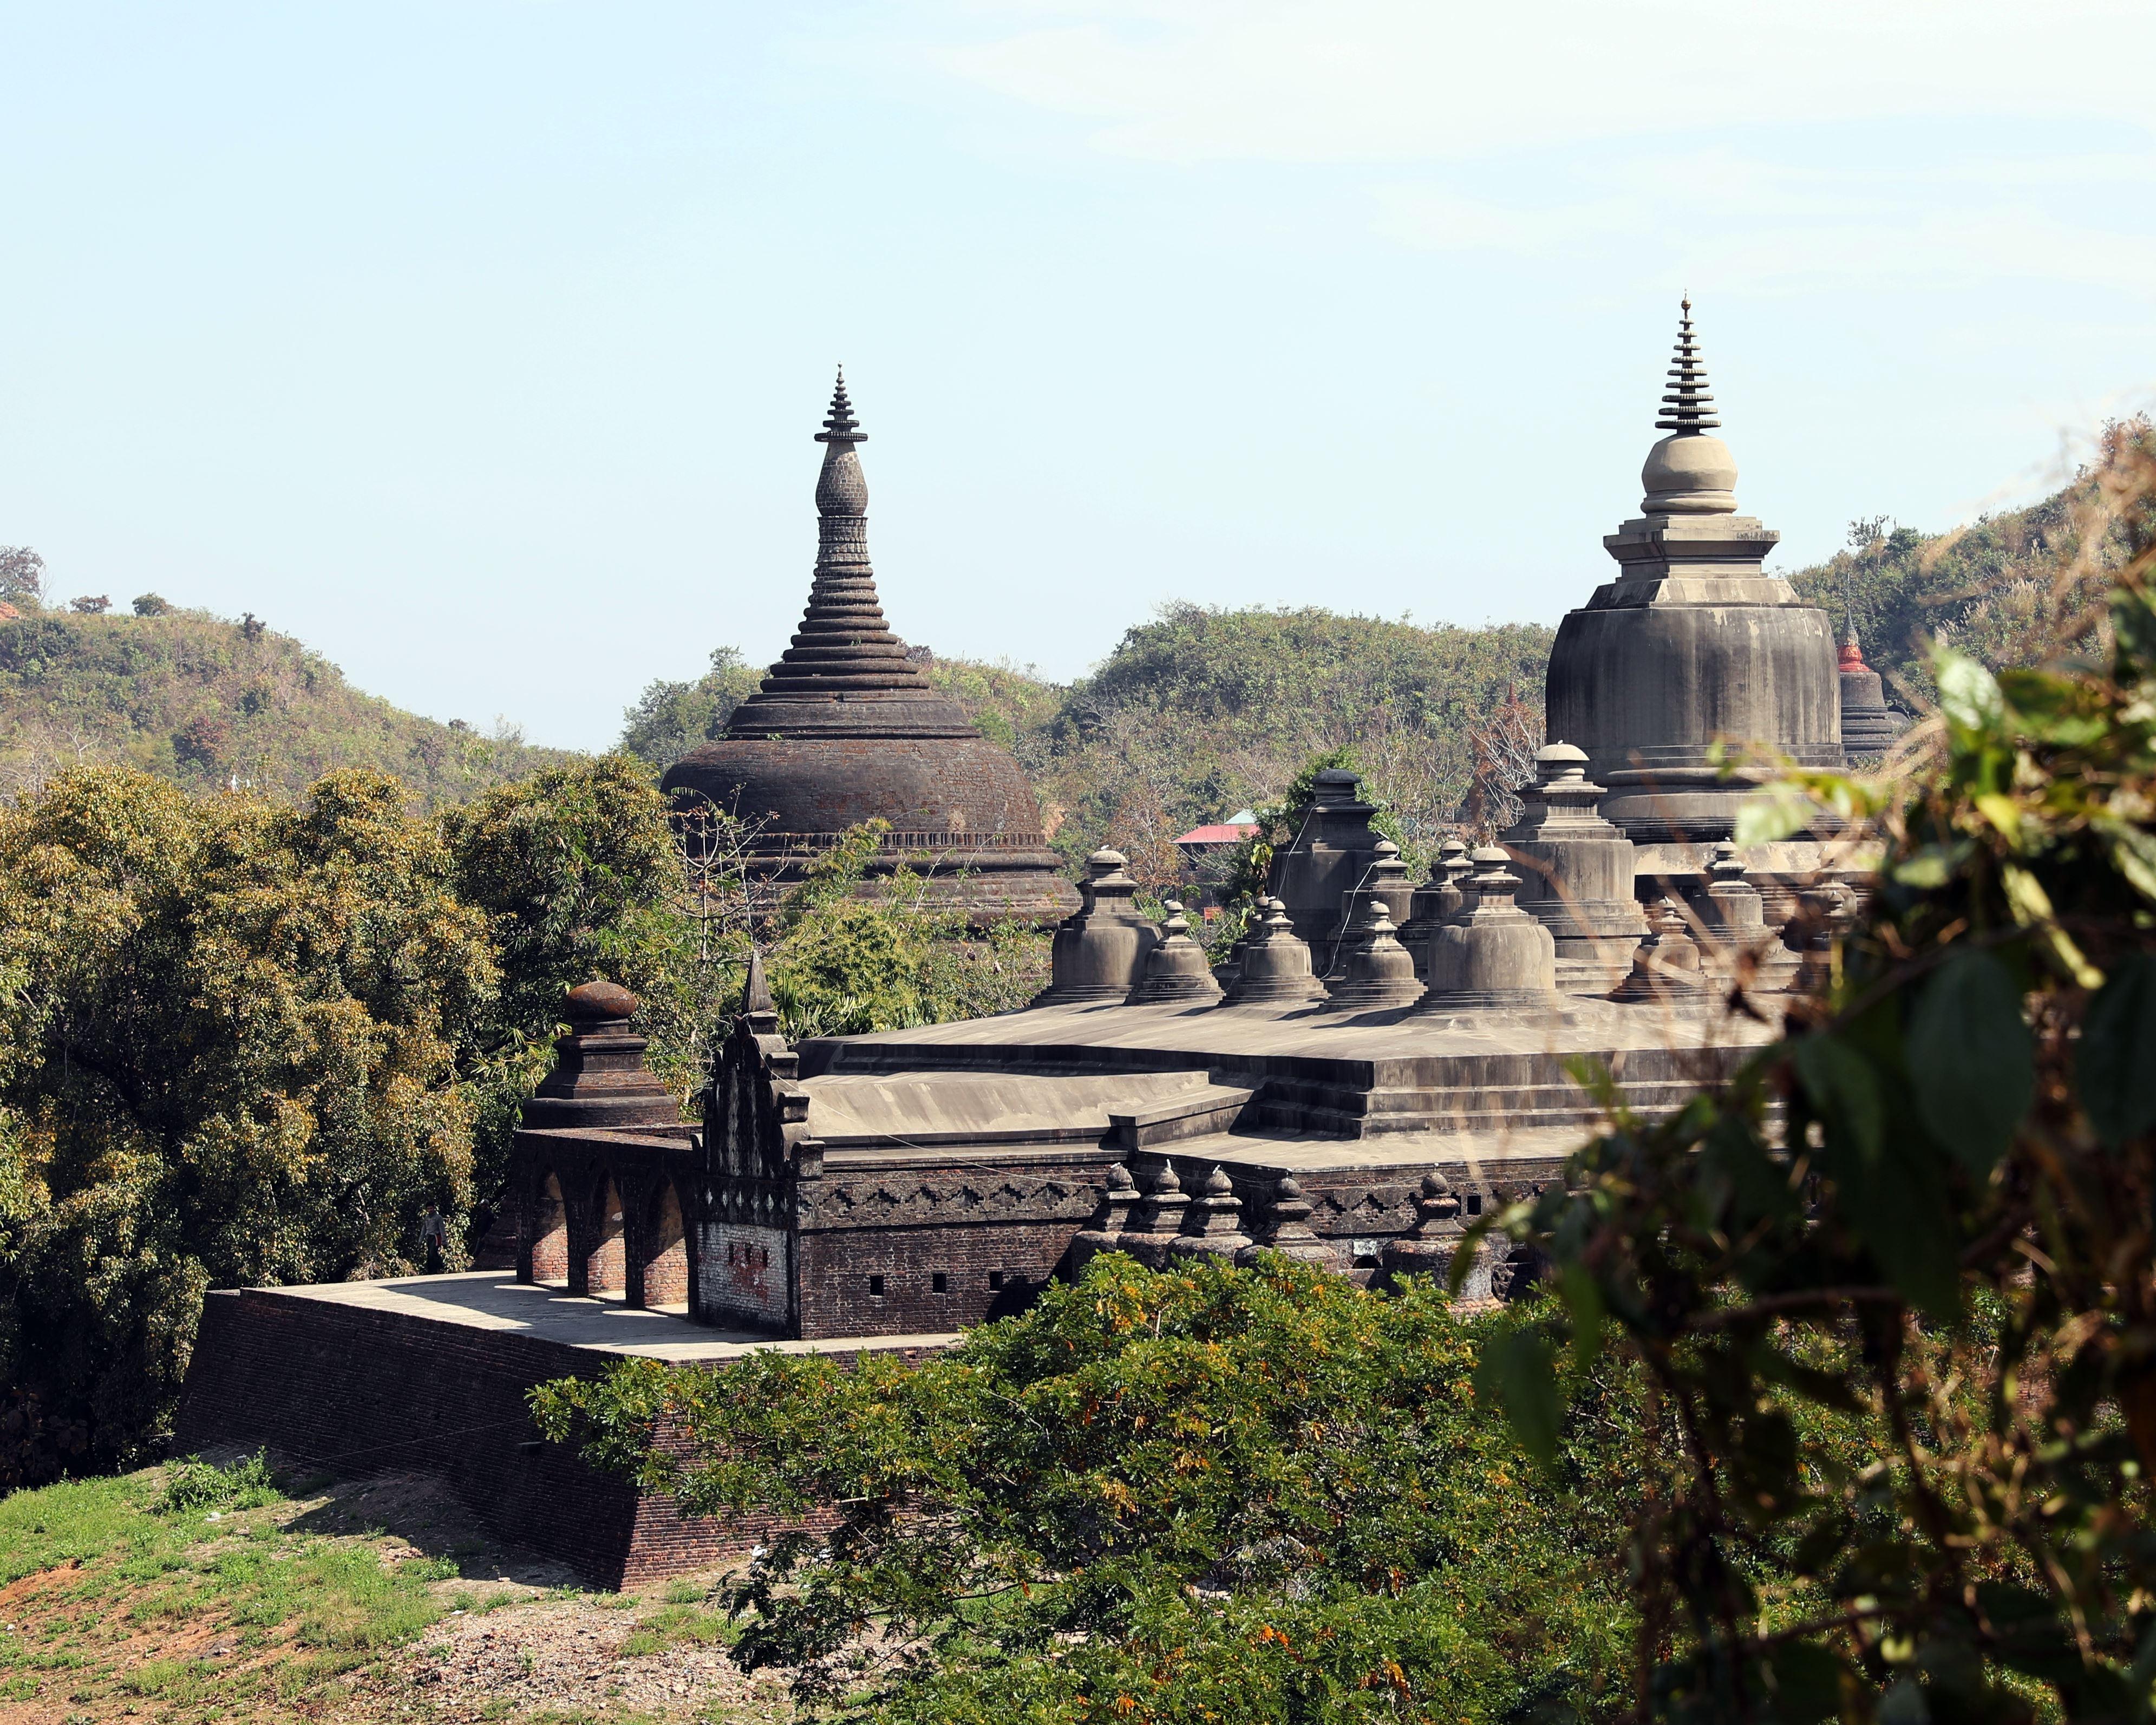 Shittaung and Andaw Pagodas